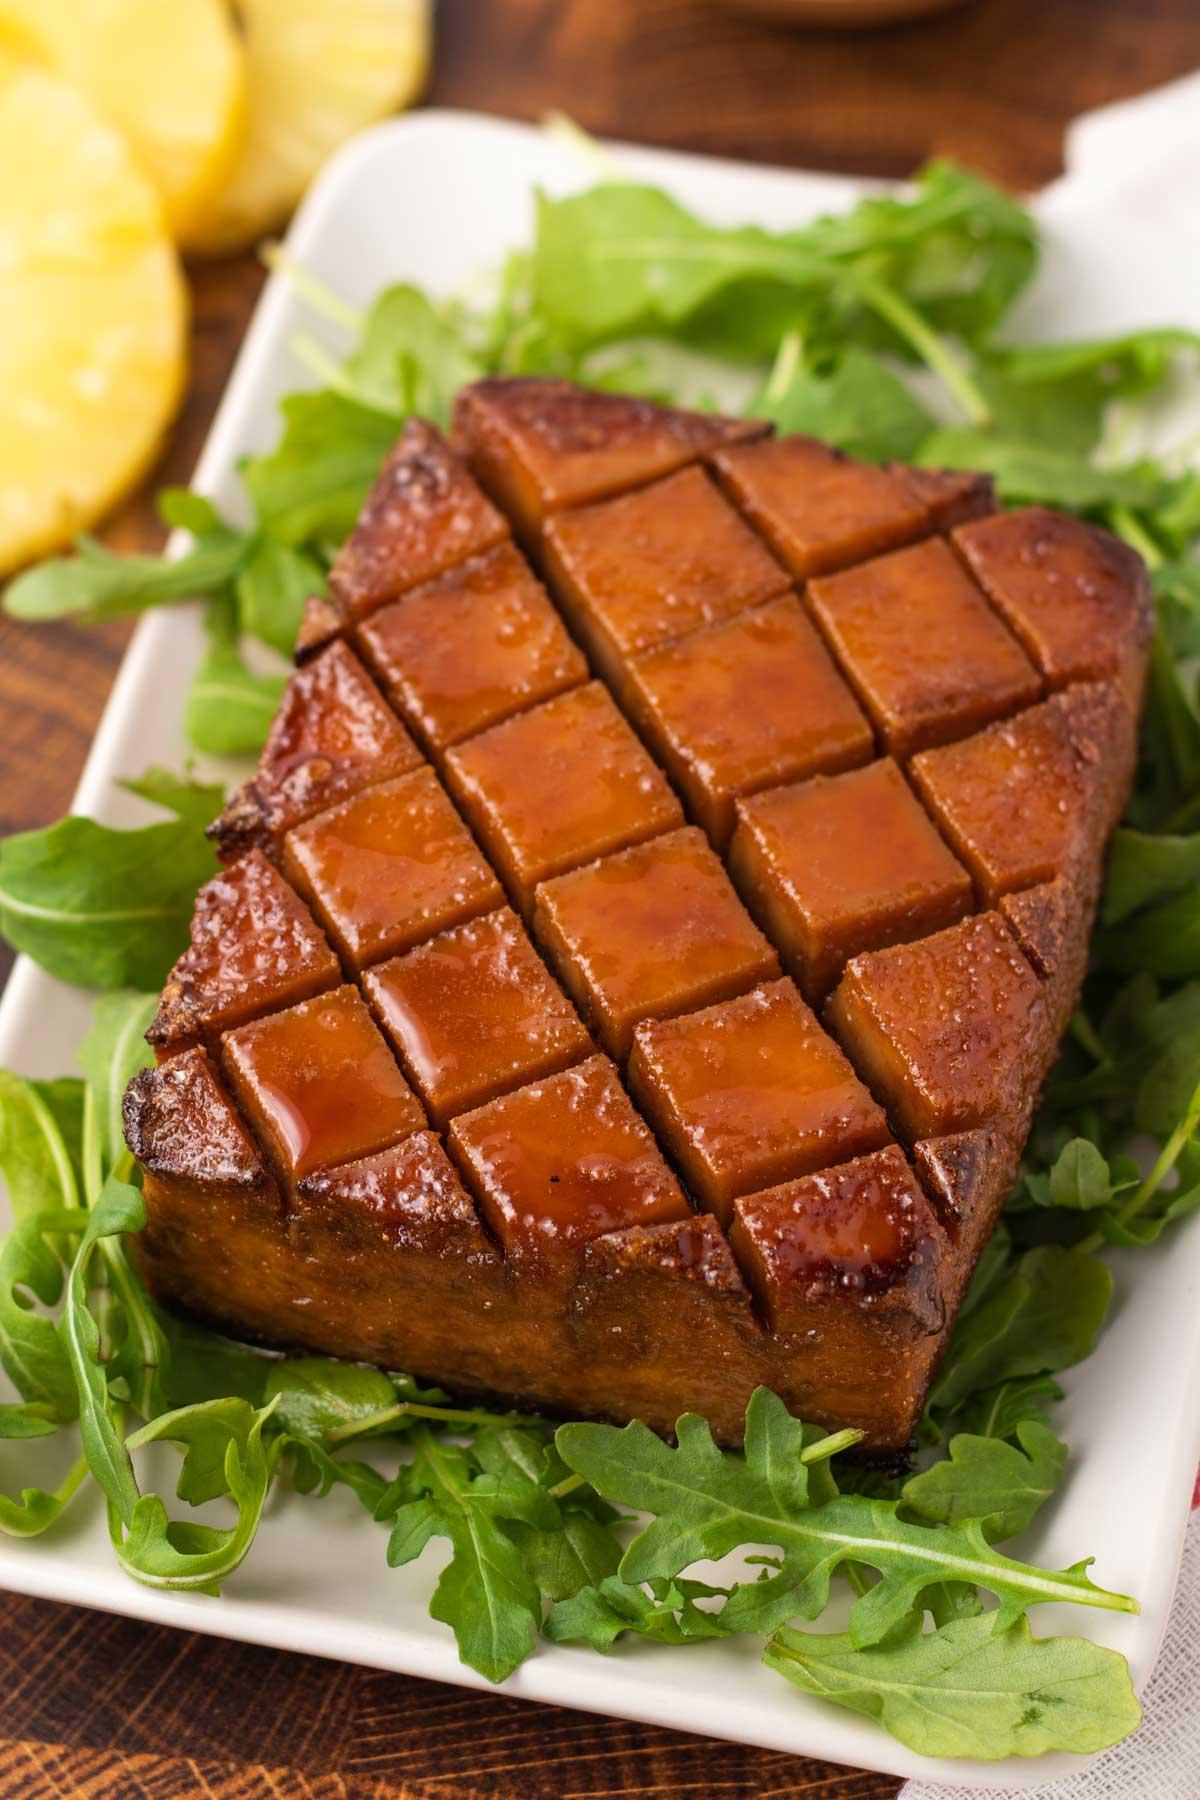 vegan holiday roast tofu with baby arugula on the plate